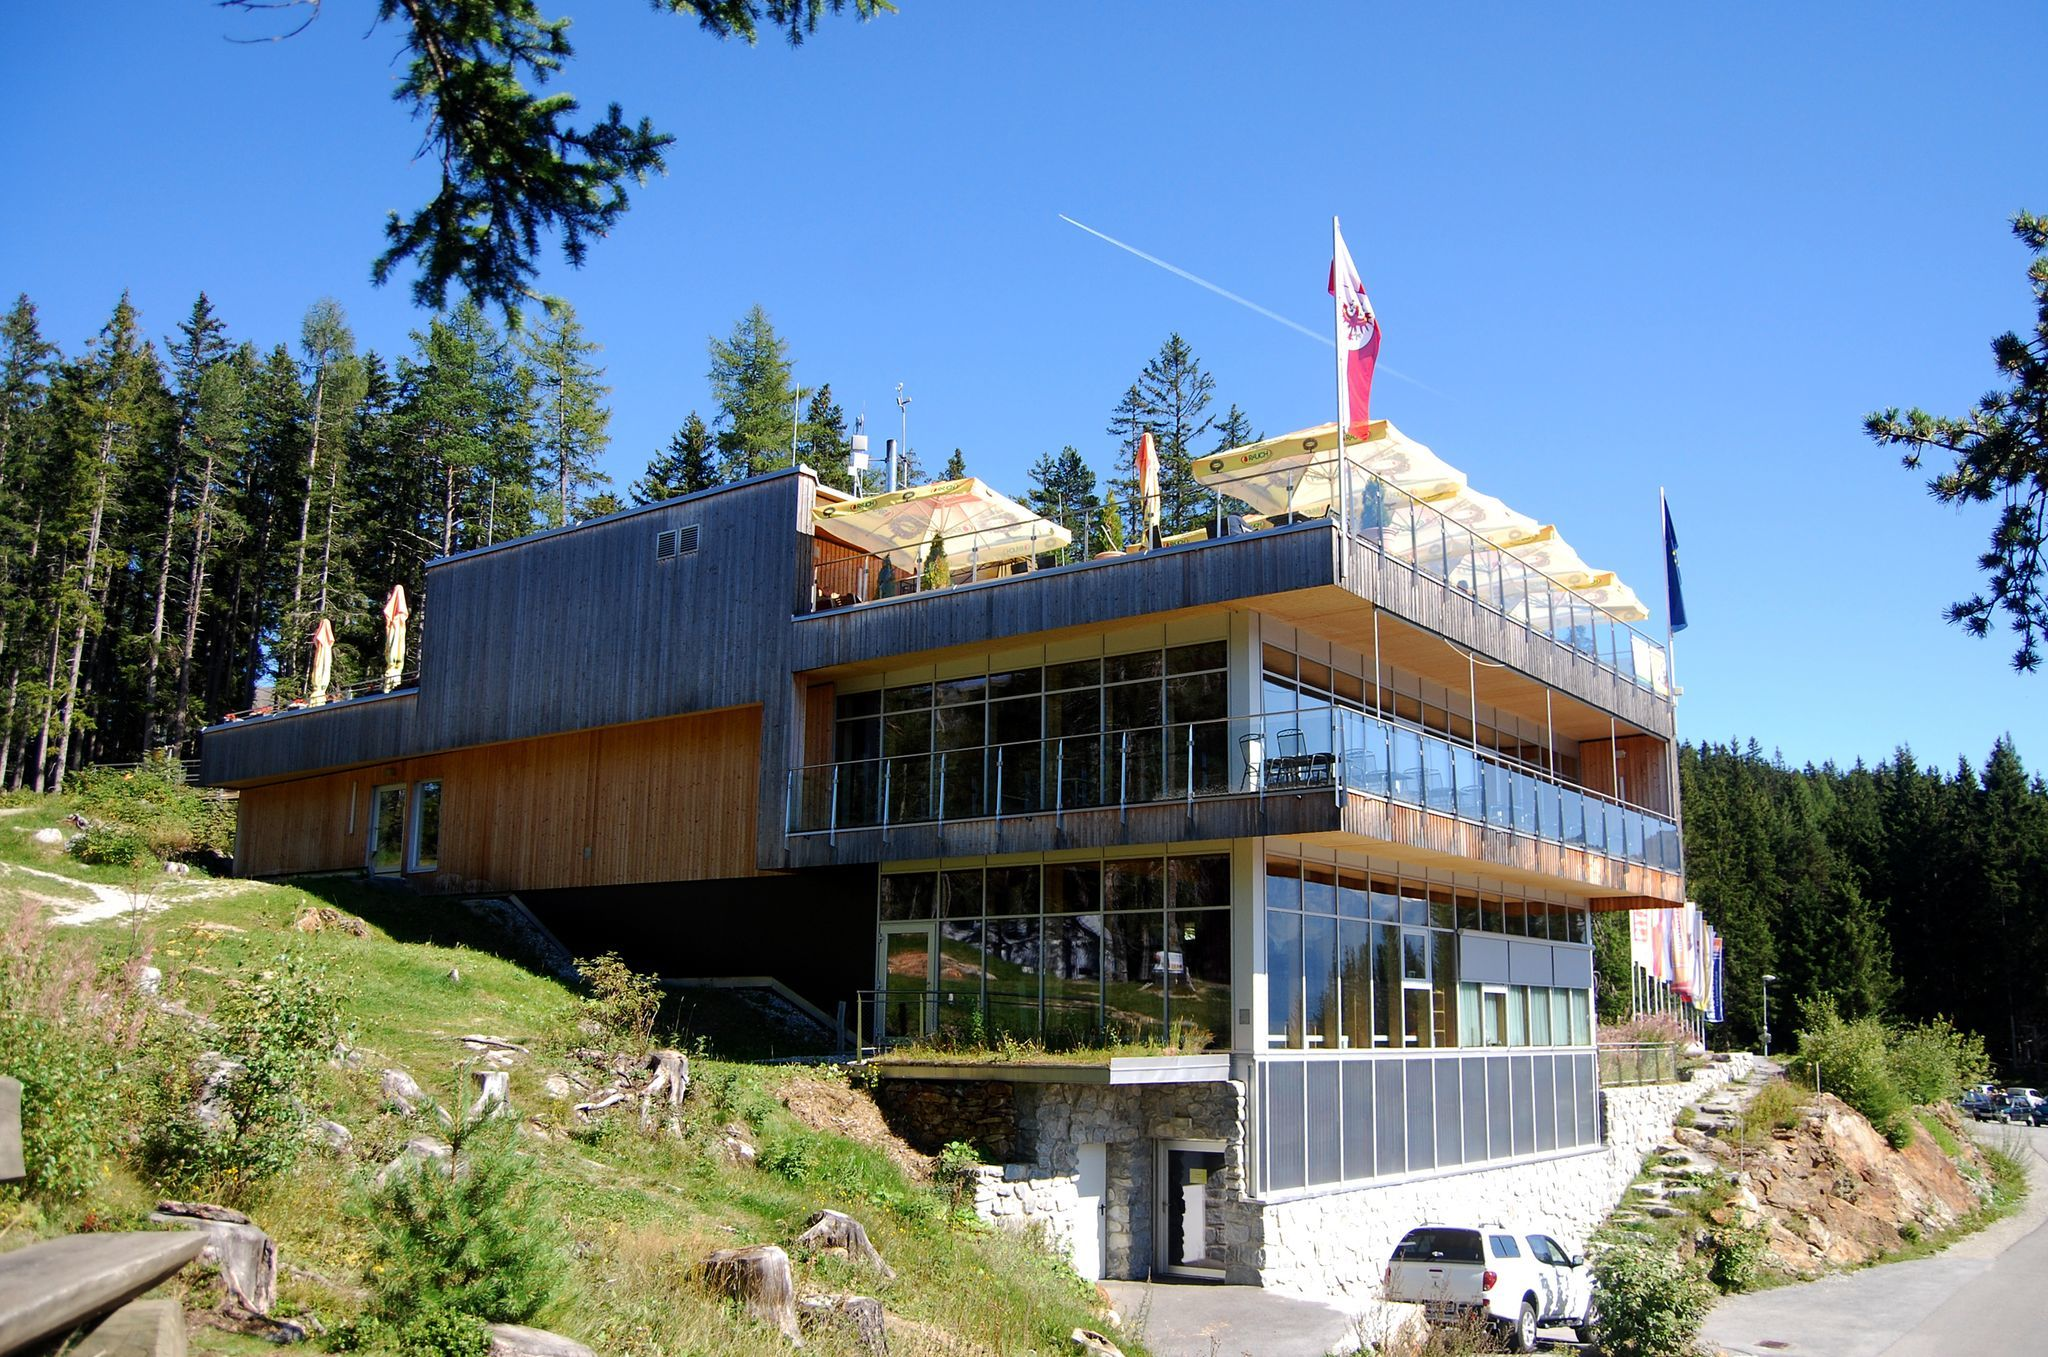 Nature Park House Kaunergrat - e-bike charging station